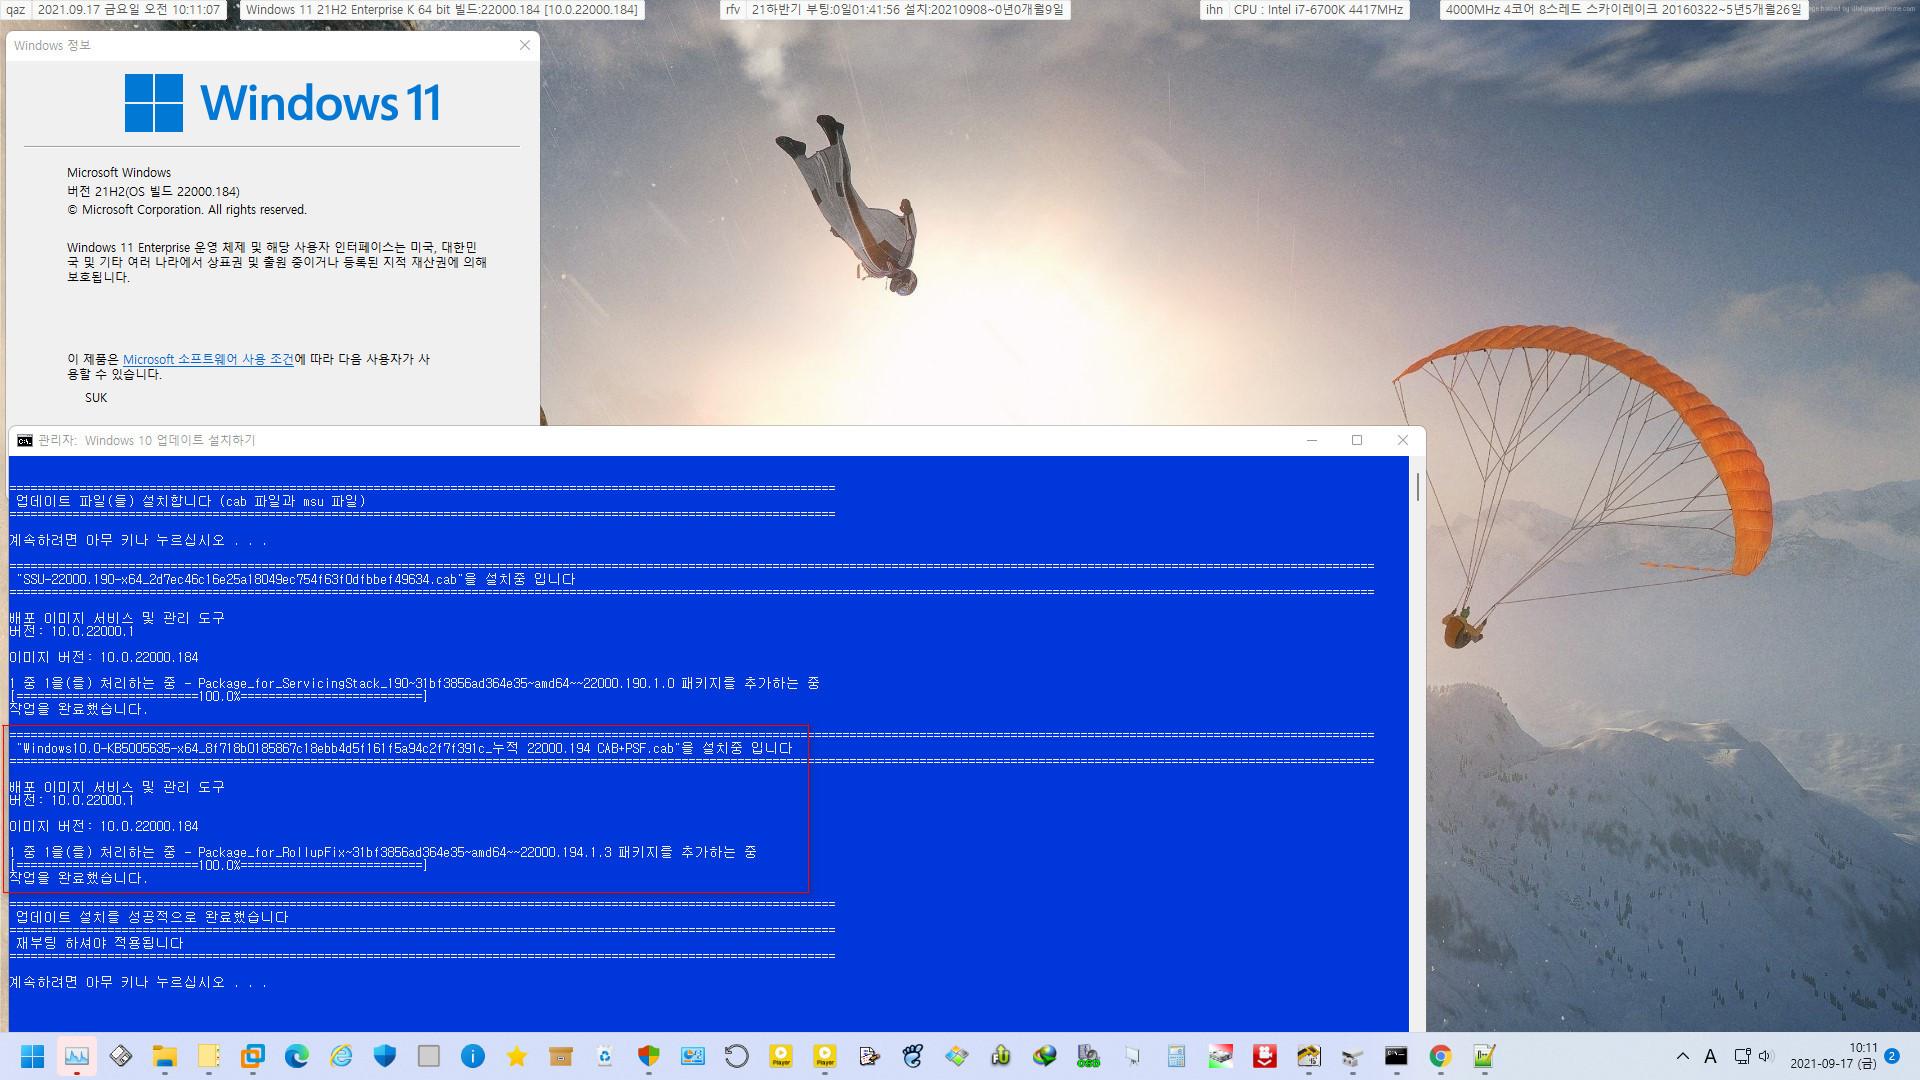 Windows 11 인사이더 프리뷰 - 버전 21H2 (OS 빌드 22000.194) 나왔네요 - 베타 채널 + 릴리스 프리뷰 채널 - 누적 업데이트가 설치되지 않아서 여러가지 시도하다가 dism 복원이 효과가 있었는지 설치 성공하긴 했습니다 2021-09-17_101108.jpg